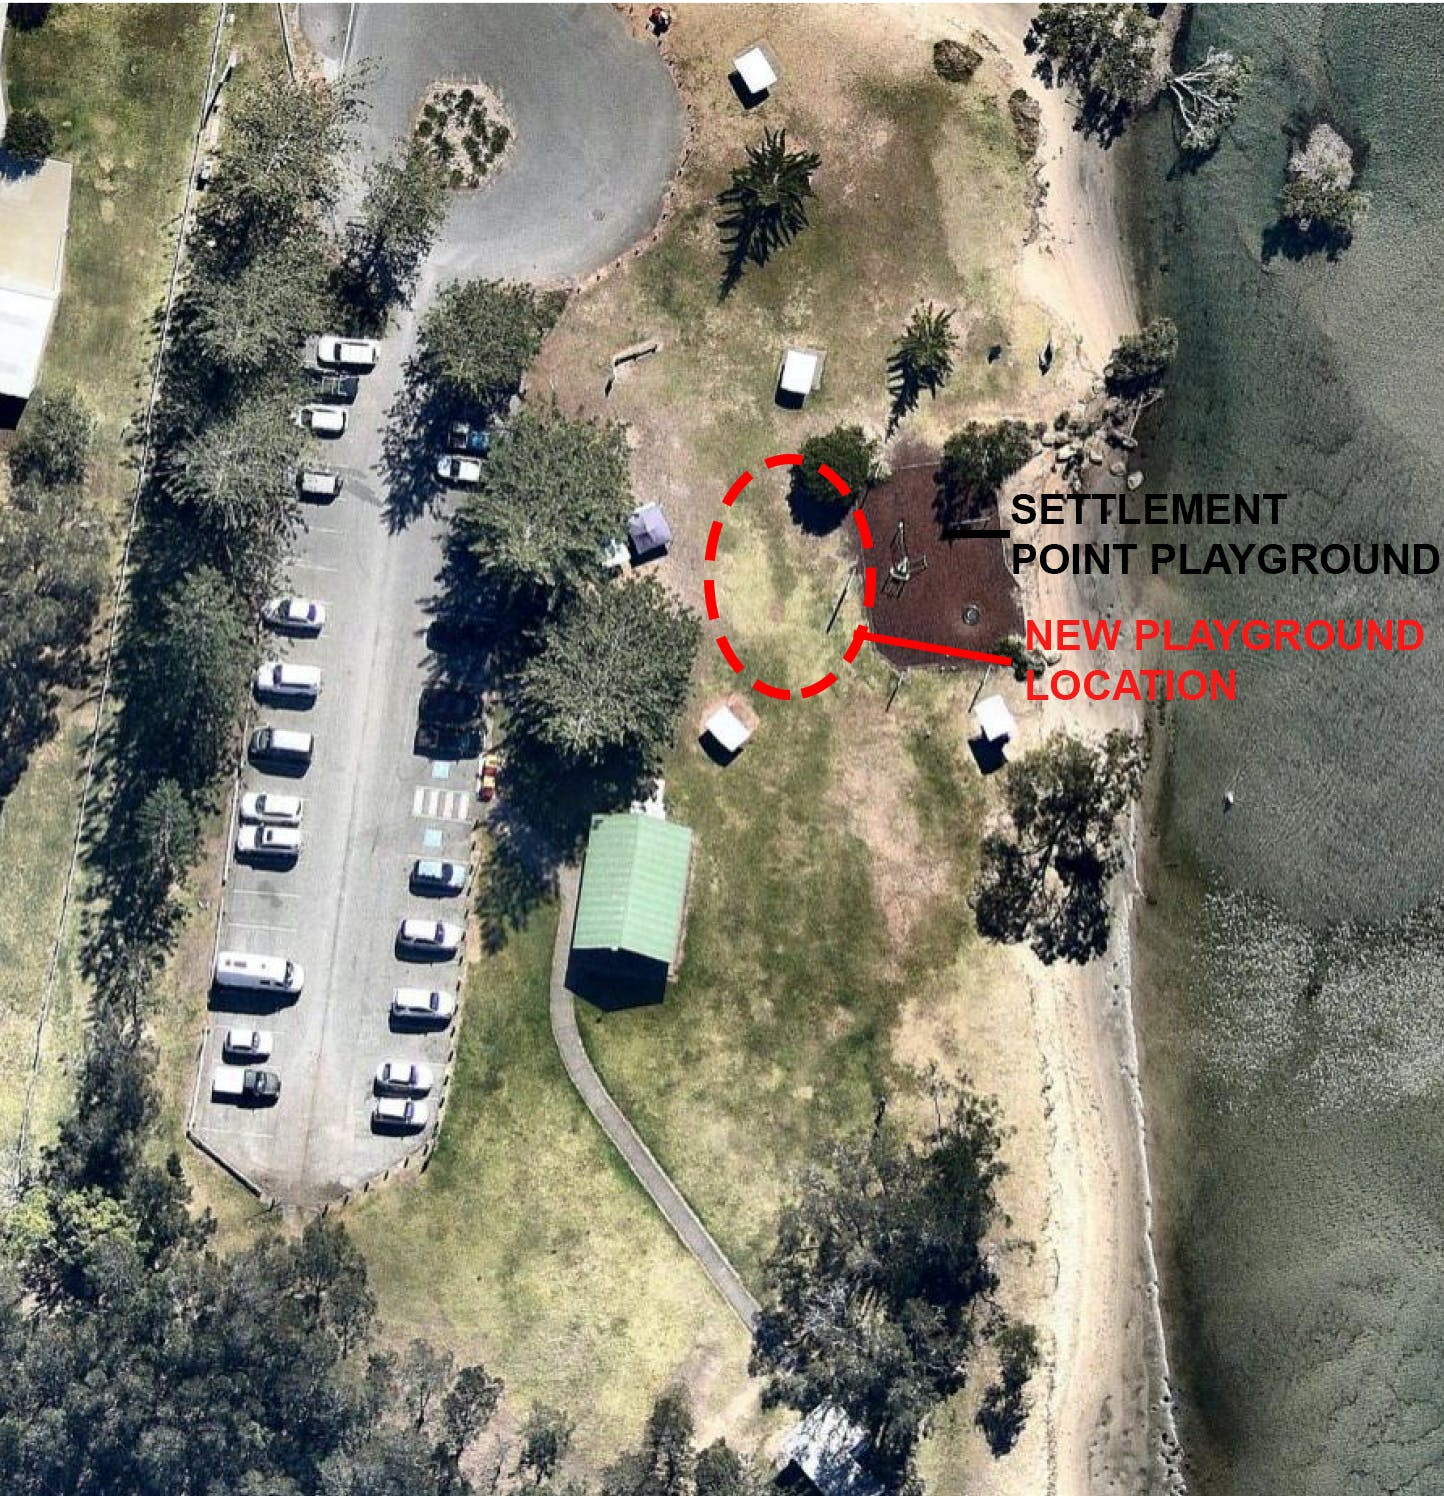 Playground Location